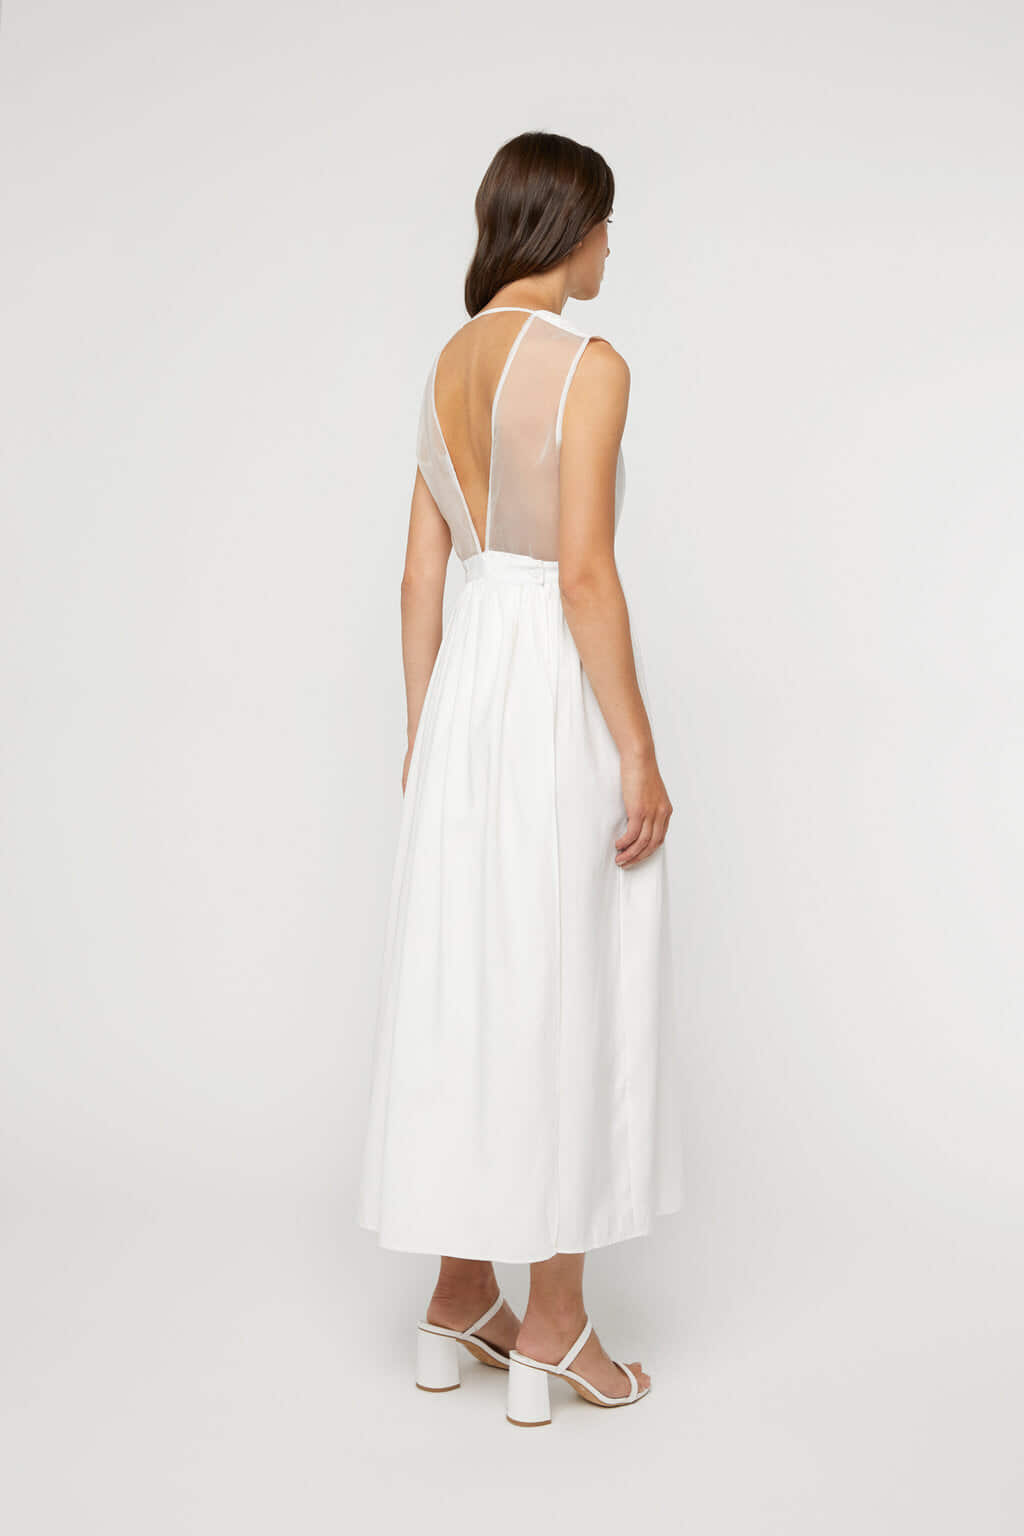 Dress K0231 Cream 4